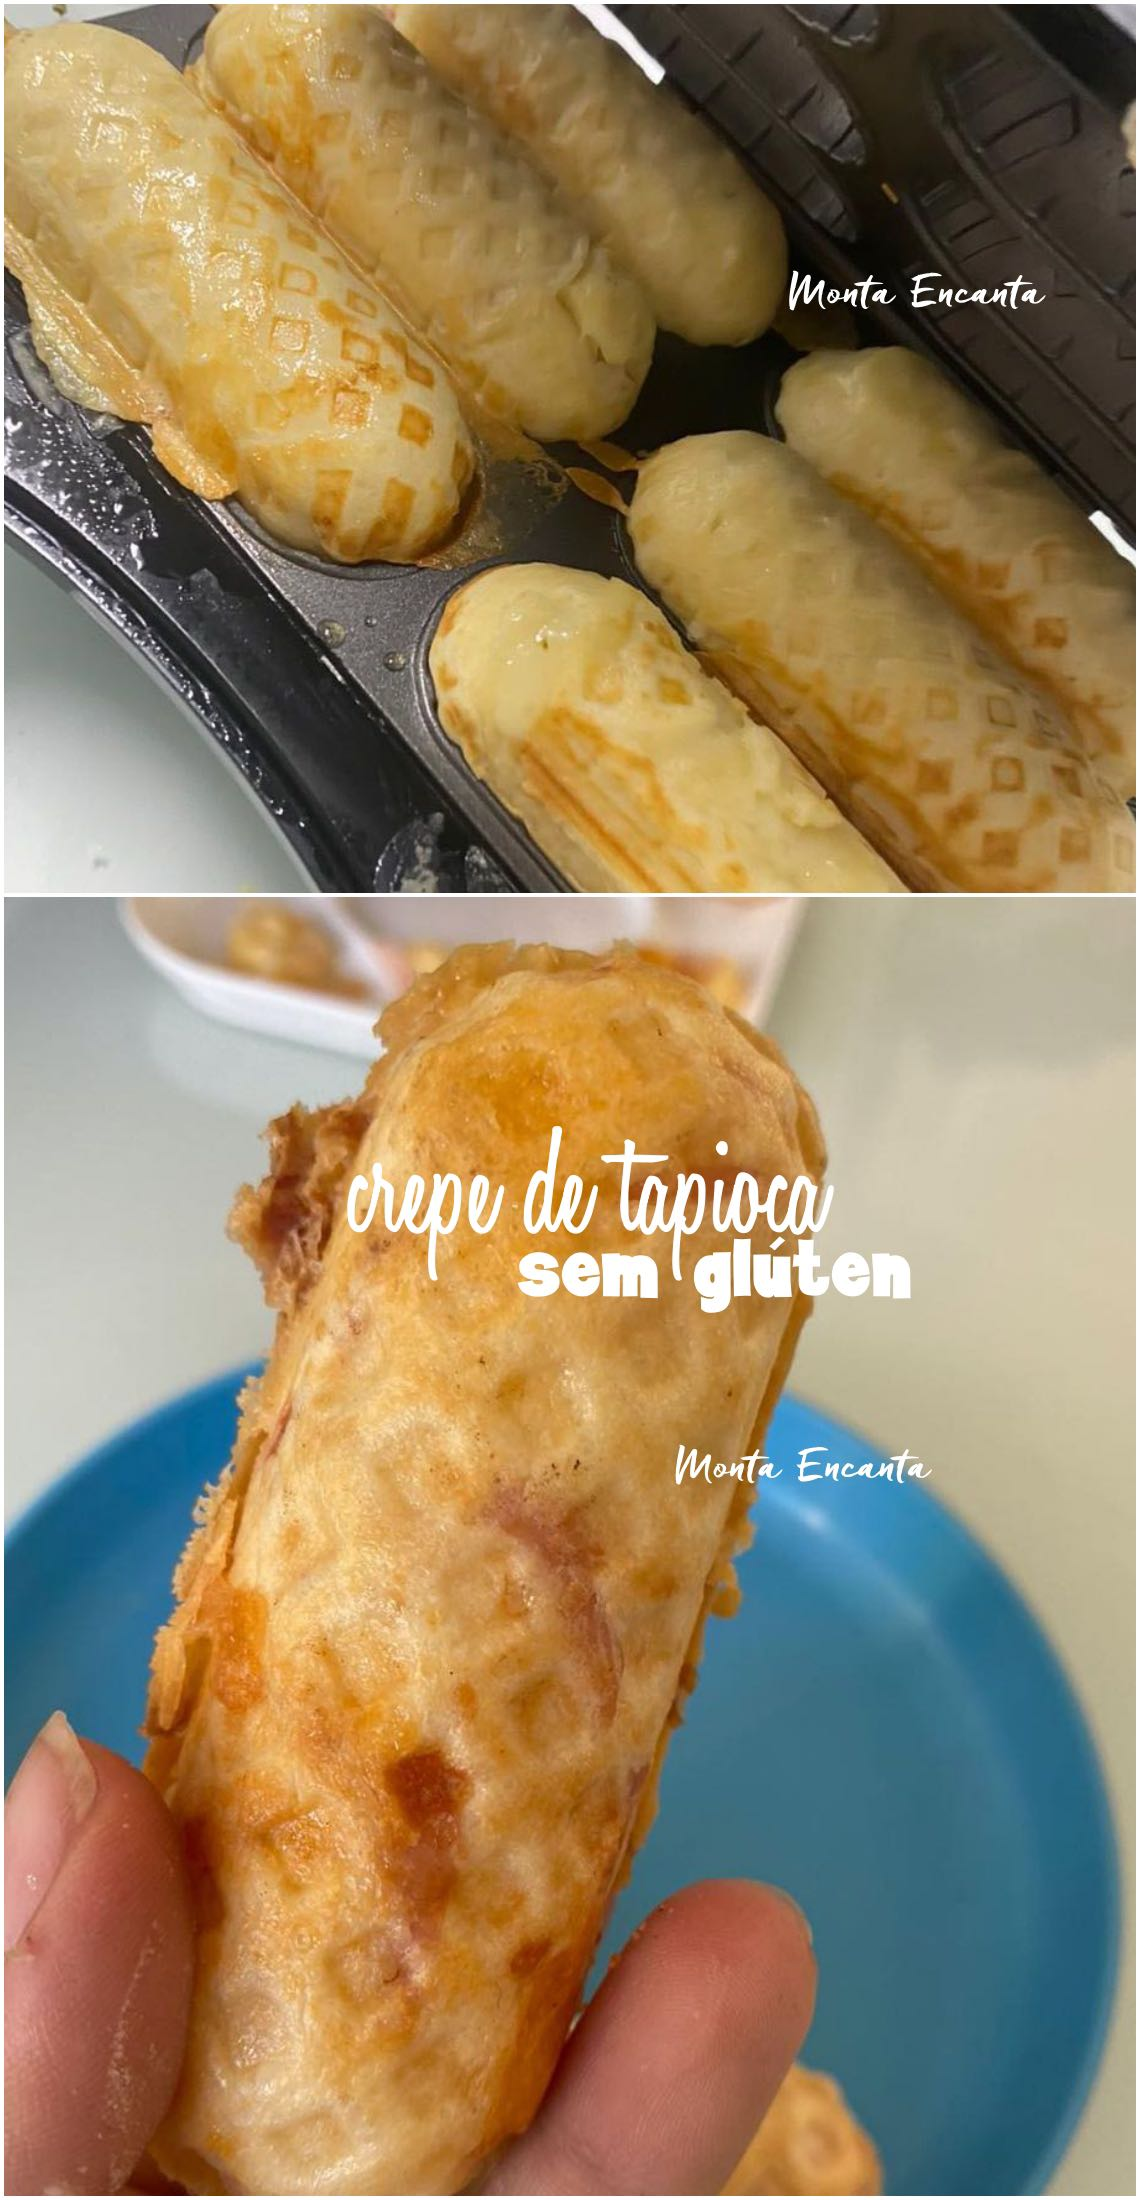 crepe de tapioca sem glúten e recheado